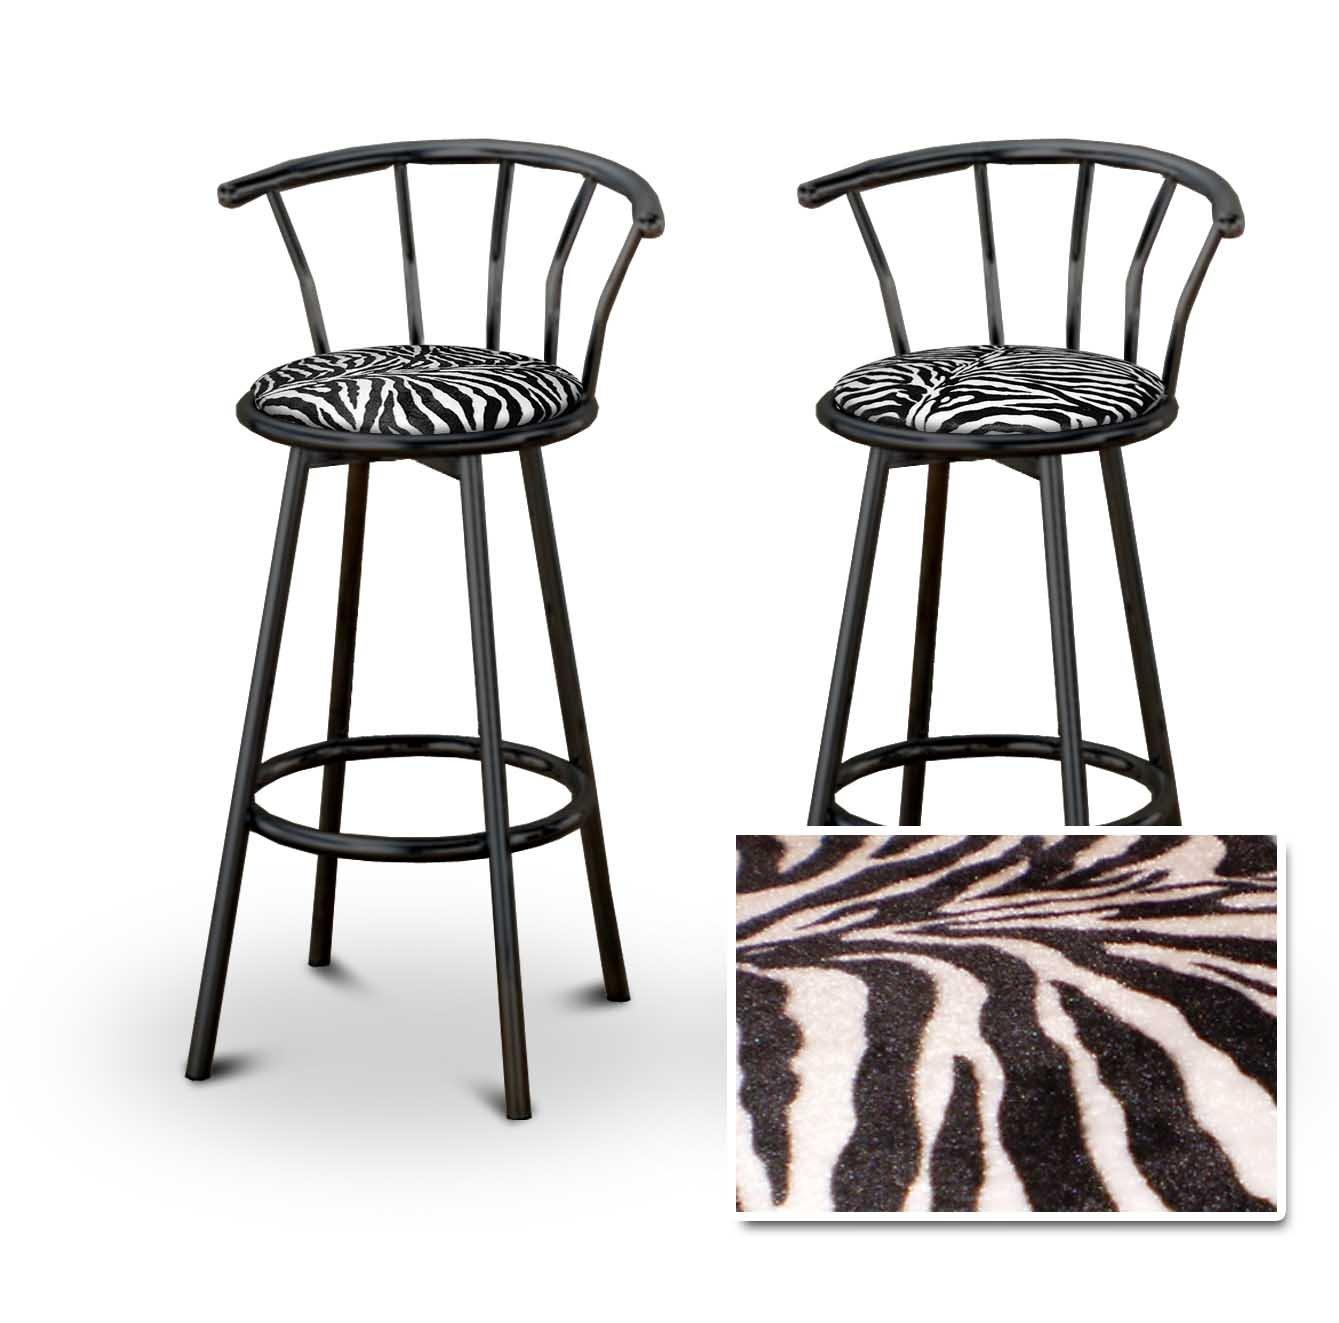 2 Animal Zebra Print Black Swivel Barstools